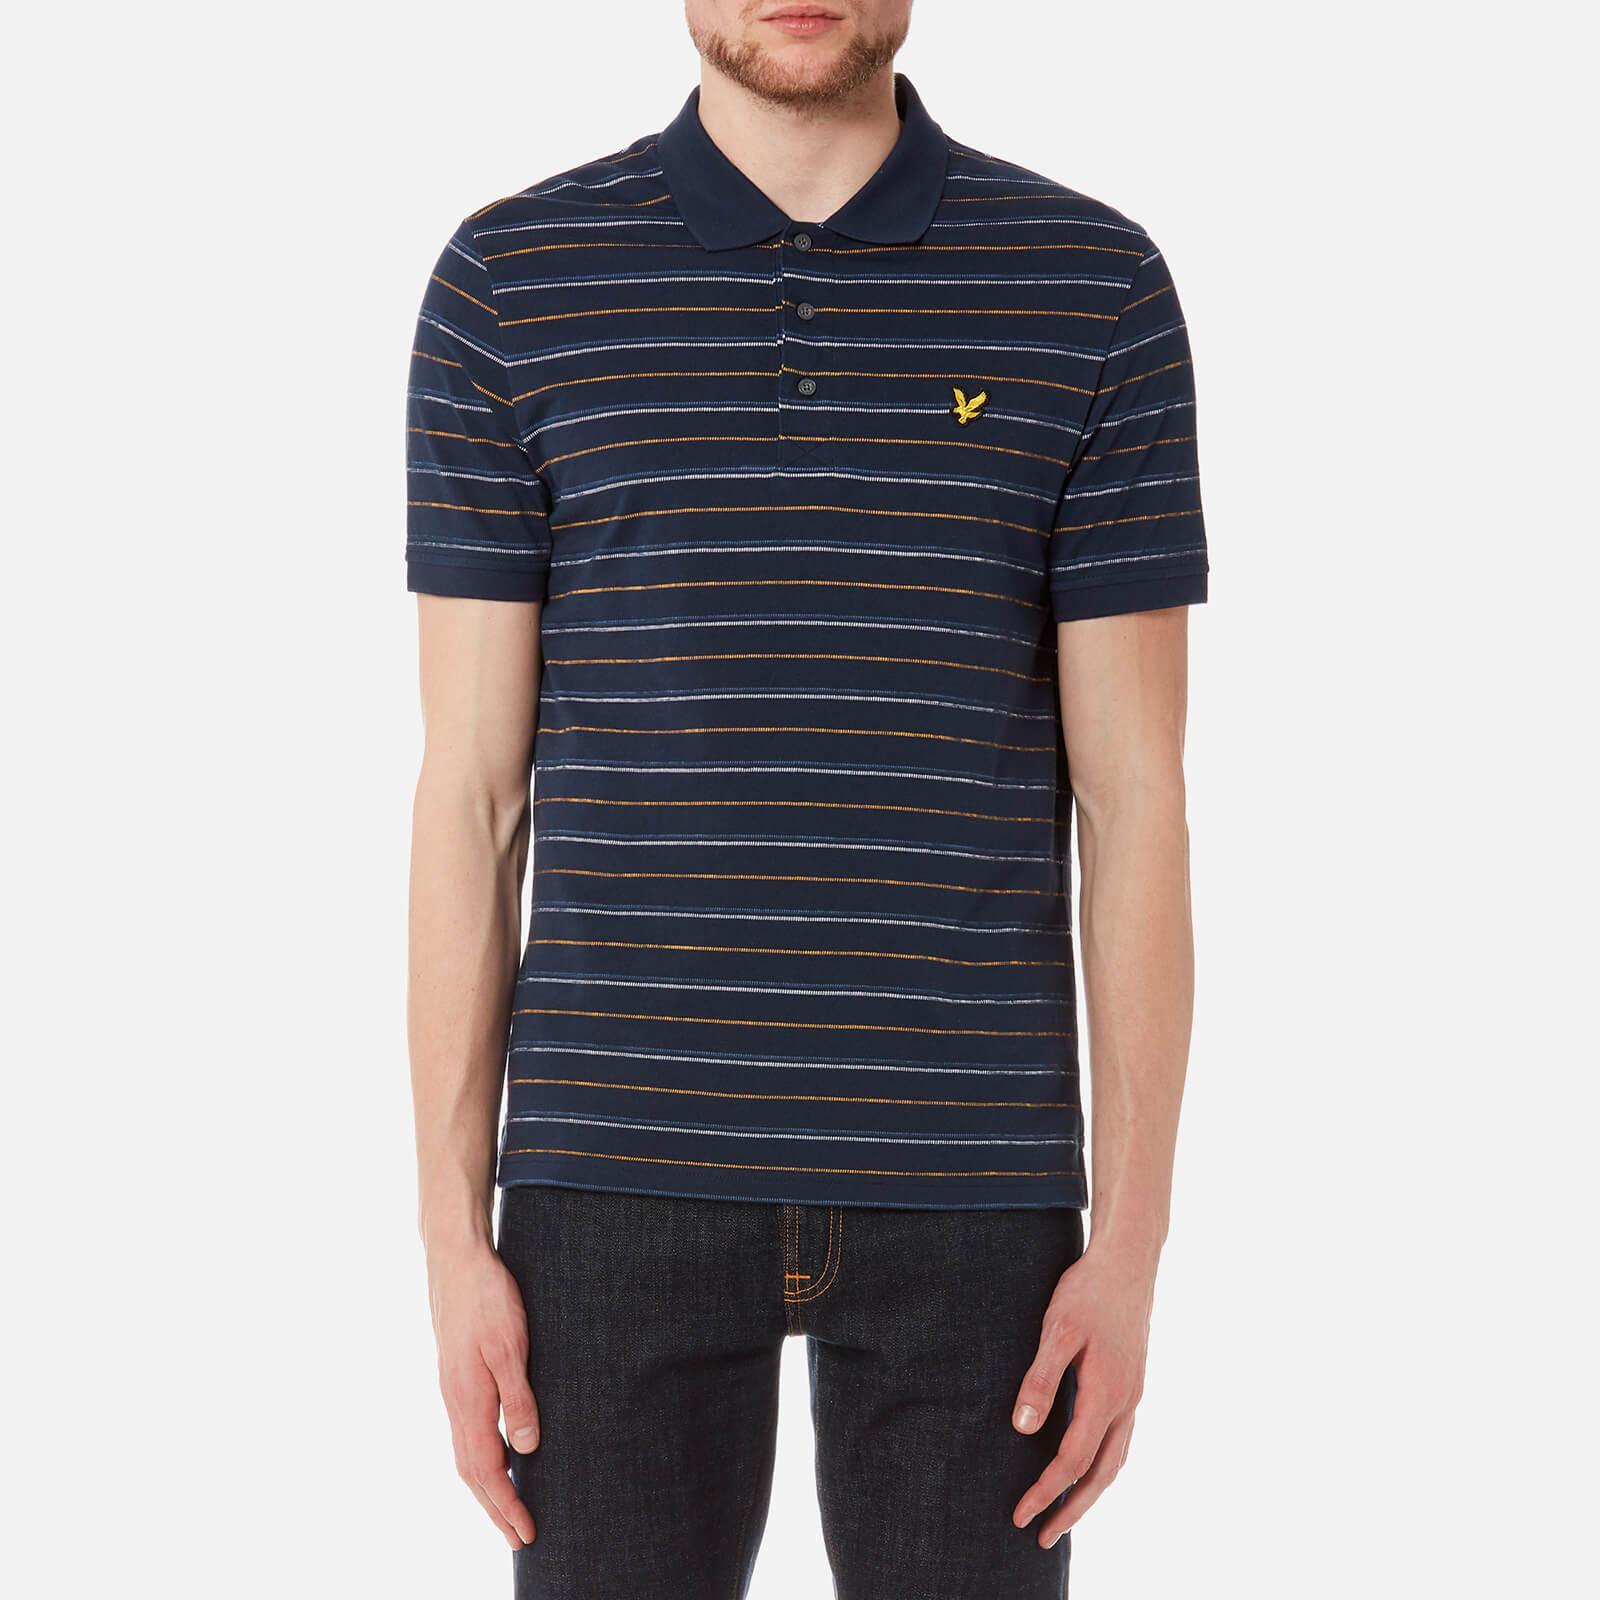 28e33c48956a4 Lyle & Scott Men's Pick Stitch Polo Shirt - Navy Clothing | TheHut.com